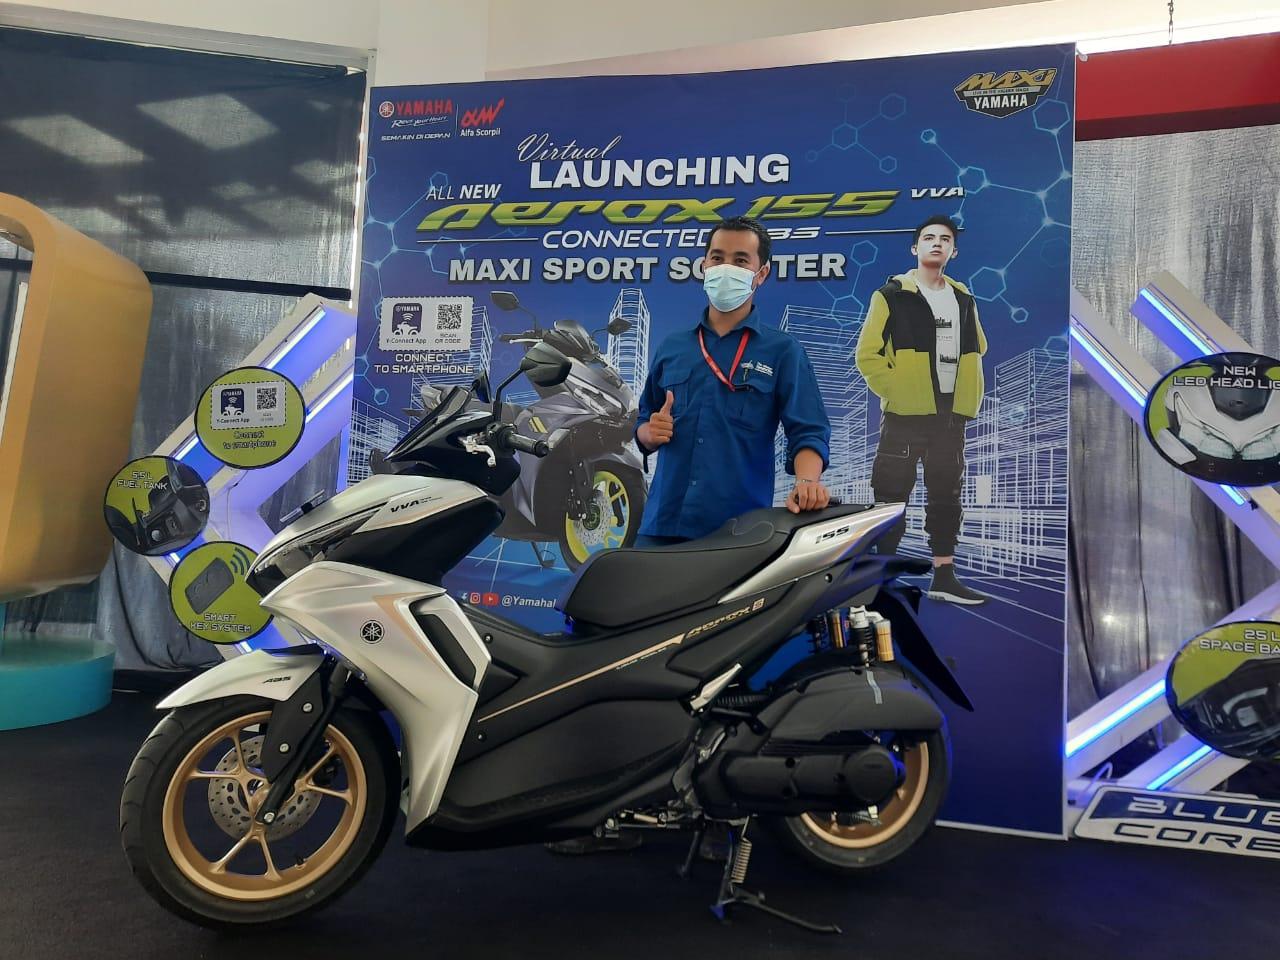 Yamaha Launching All New Aerox 155 Connected, Harganya?